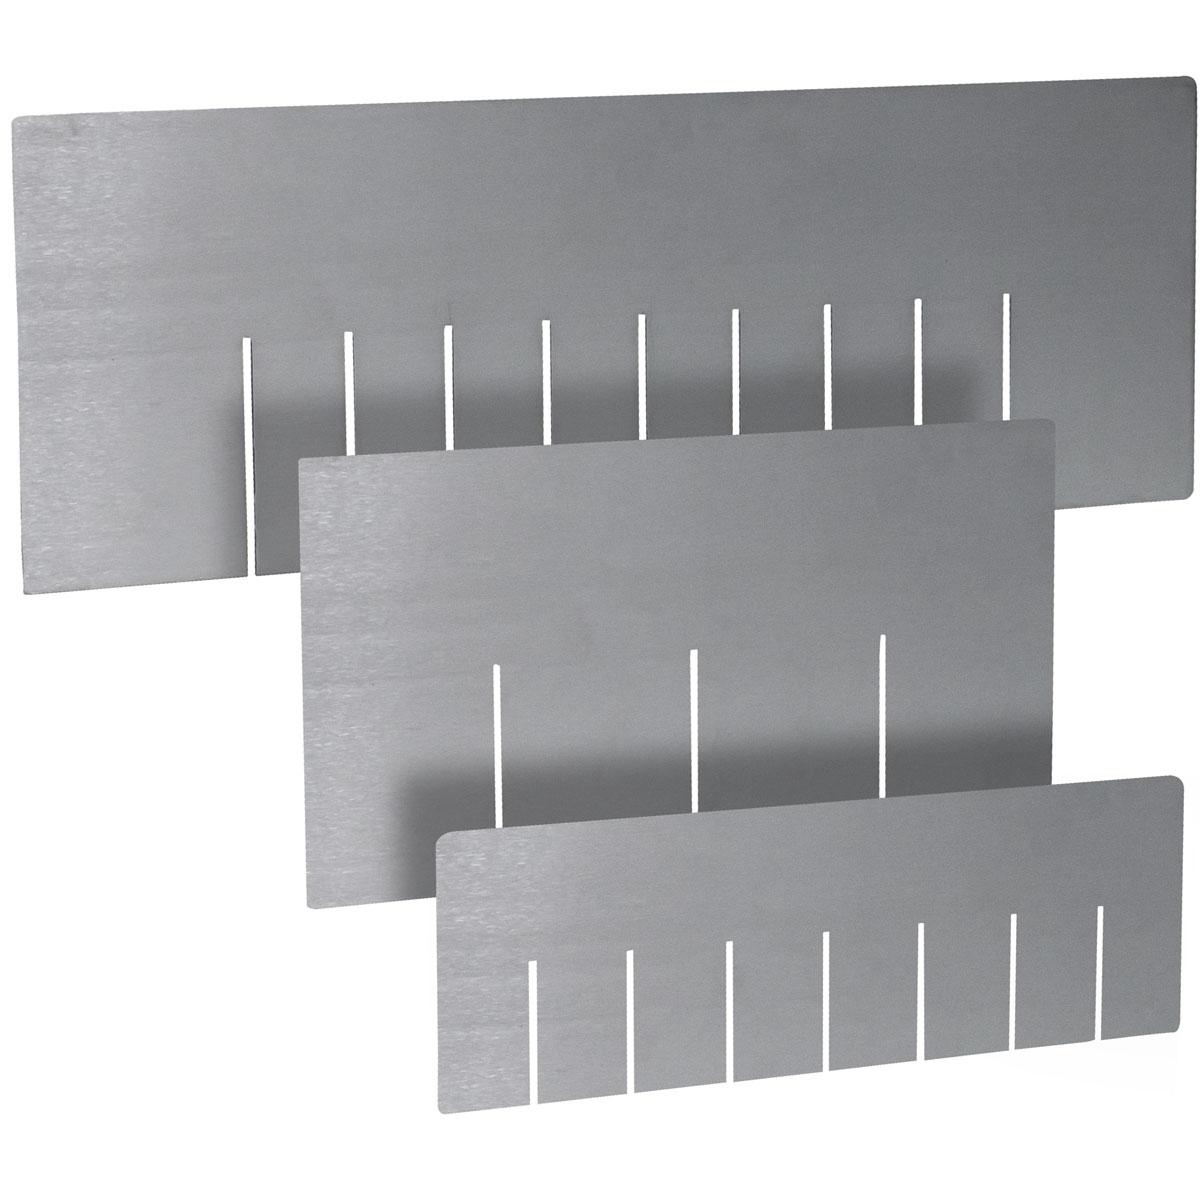 "Long Aluminum Divider15.38"" x 5.38""SKU: 521014"